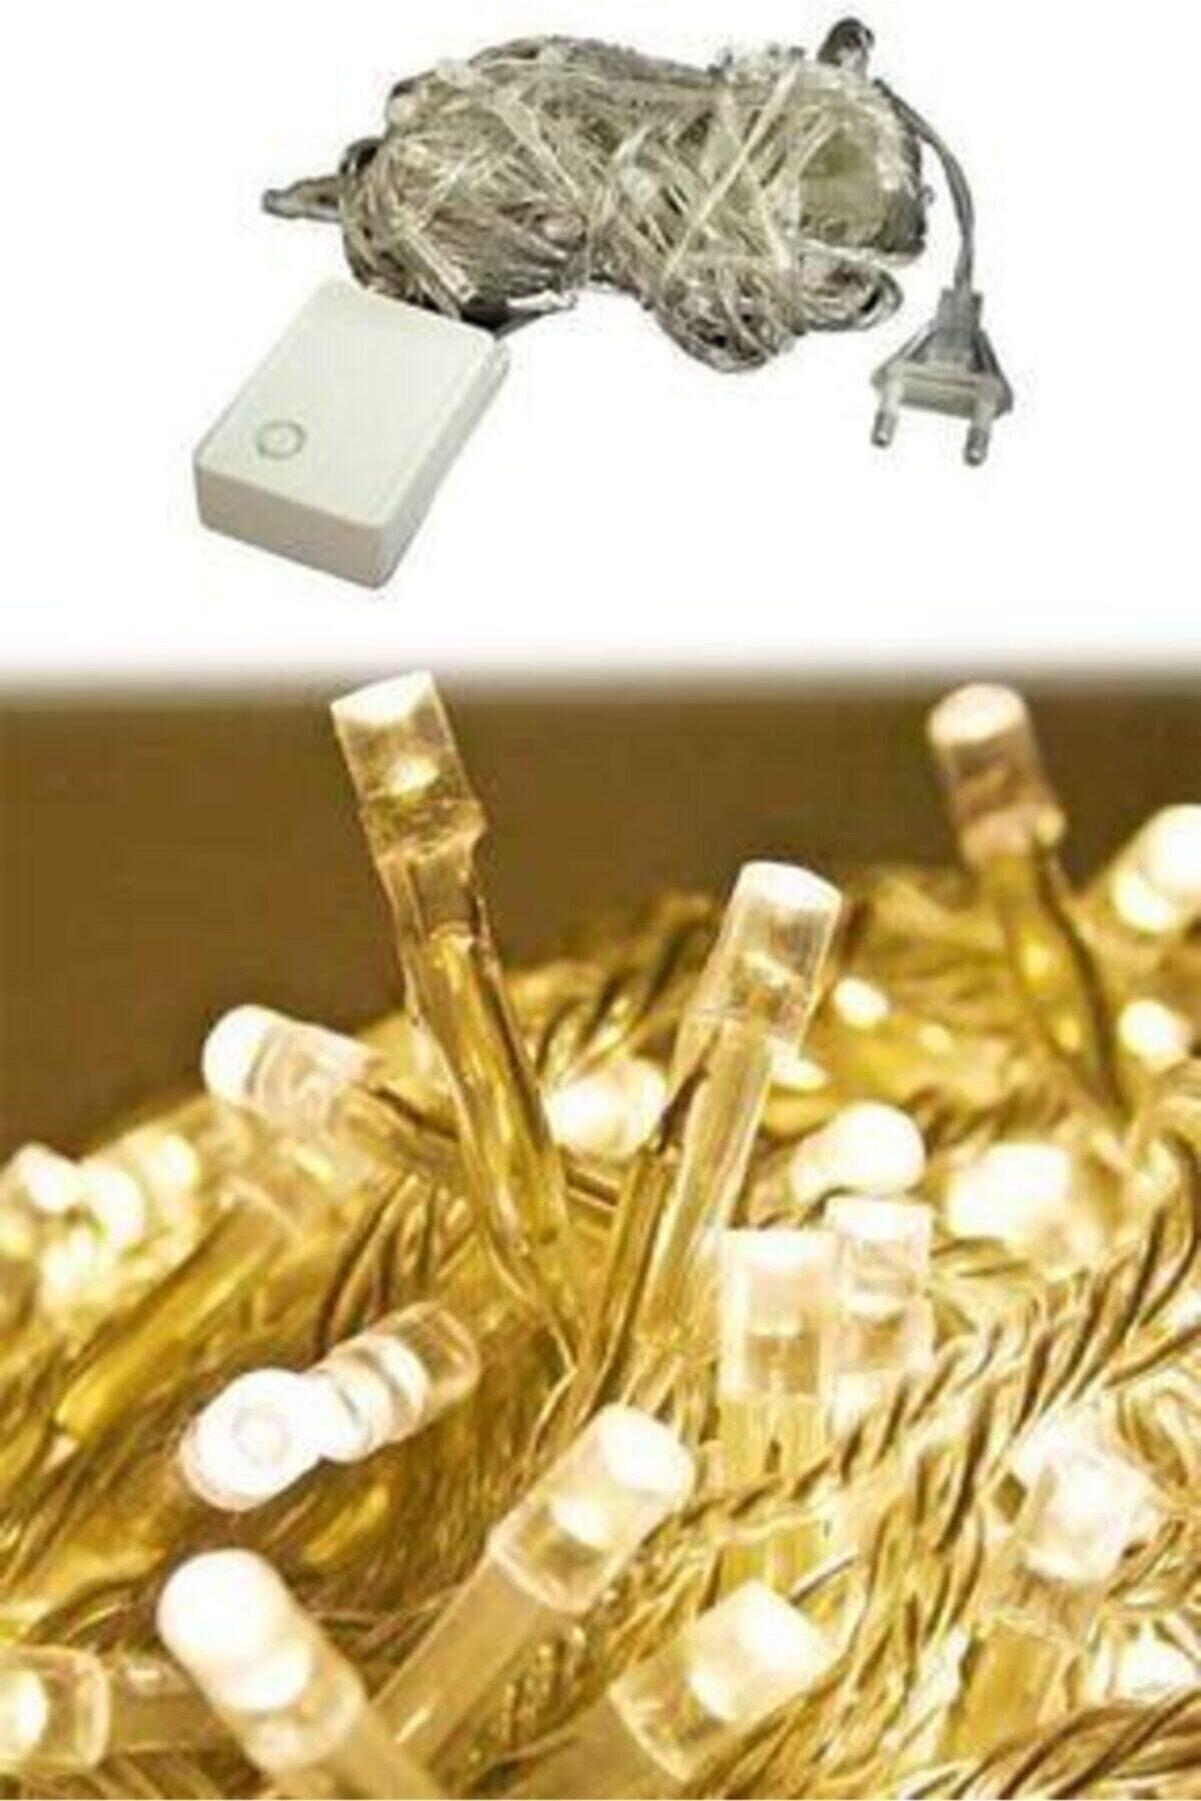 ALİTECH Kozmoparti 100 Ledli Fişli Led, Dekor Lambası 10m Günışığı Yılbaşı Ağacı Işığı 10m Fişli Led